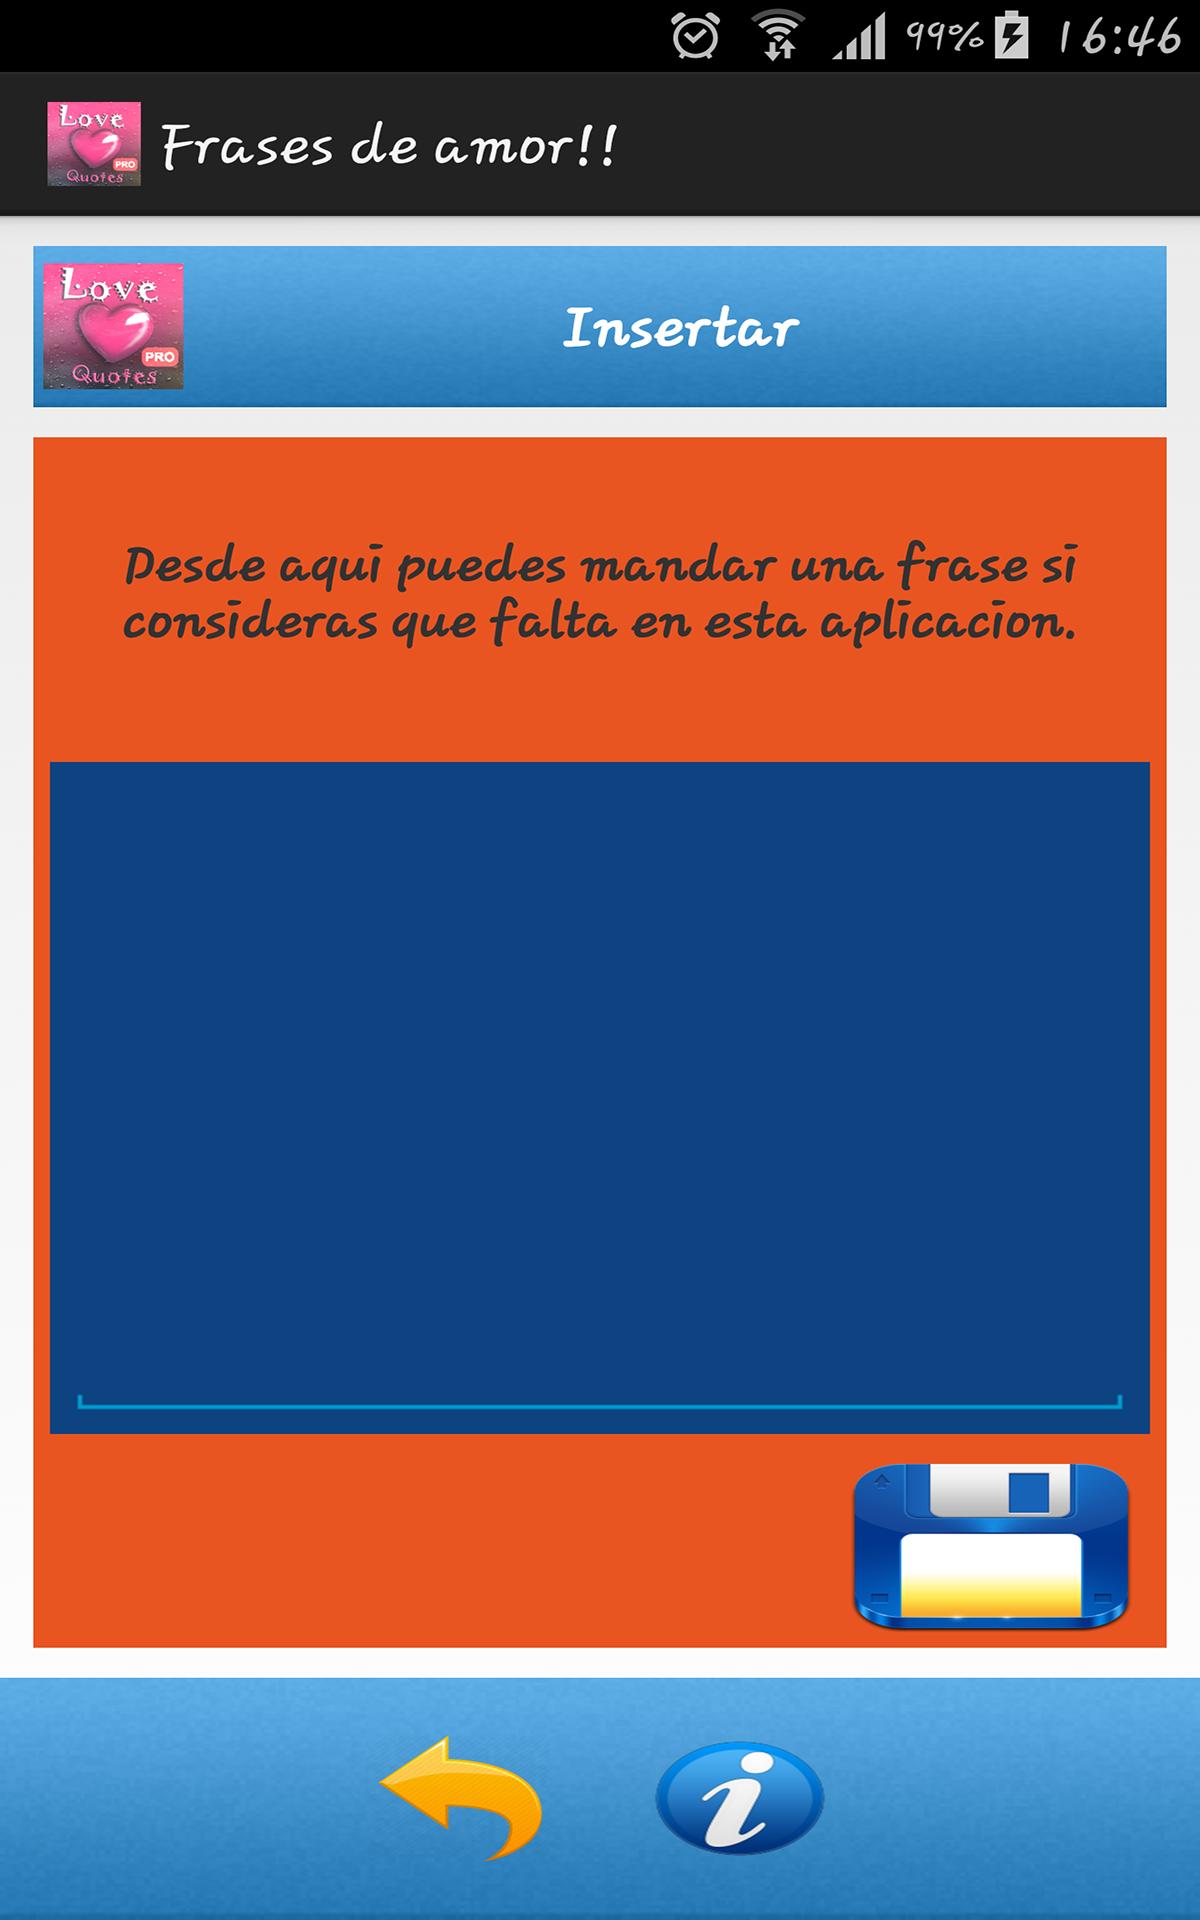 frases de amor pro: Amazon.es: Appstore para Android